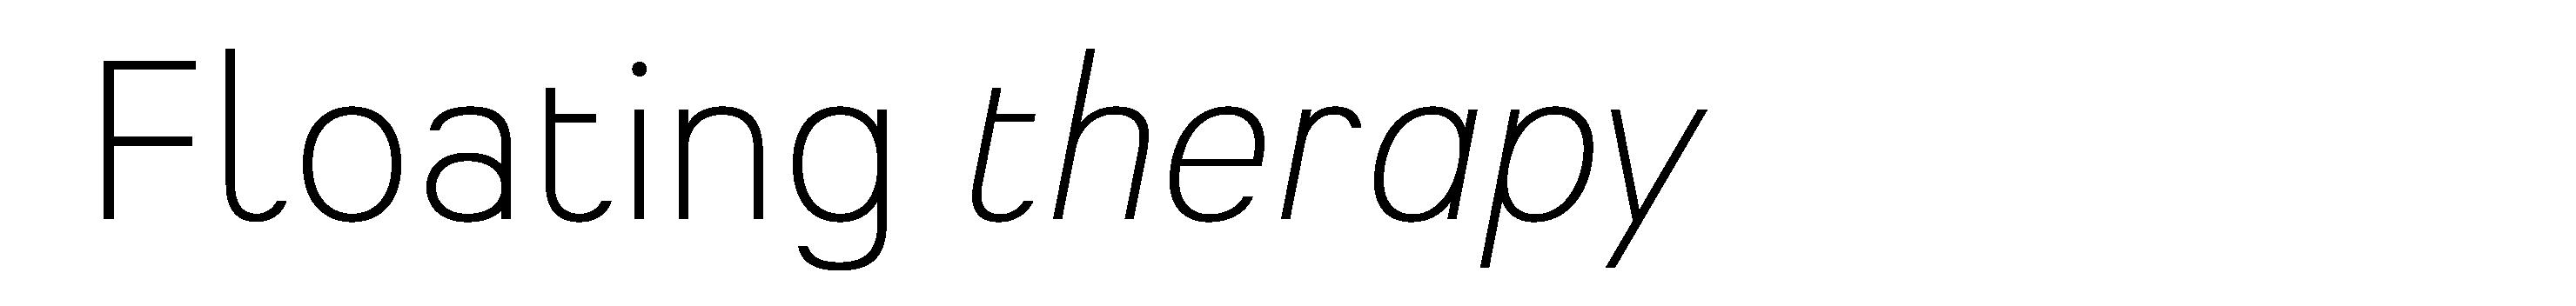 Typeface Heimat Sans D07 Atlas Font Foundry